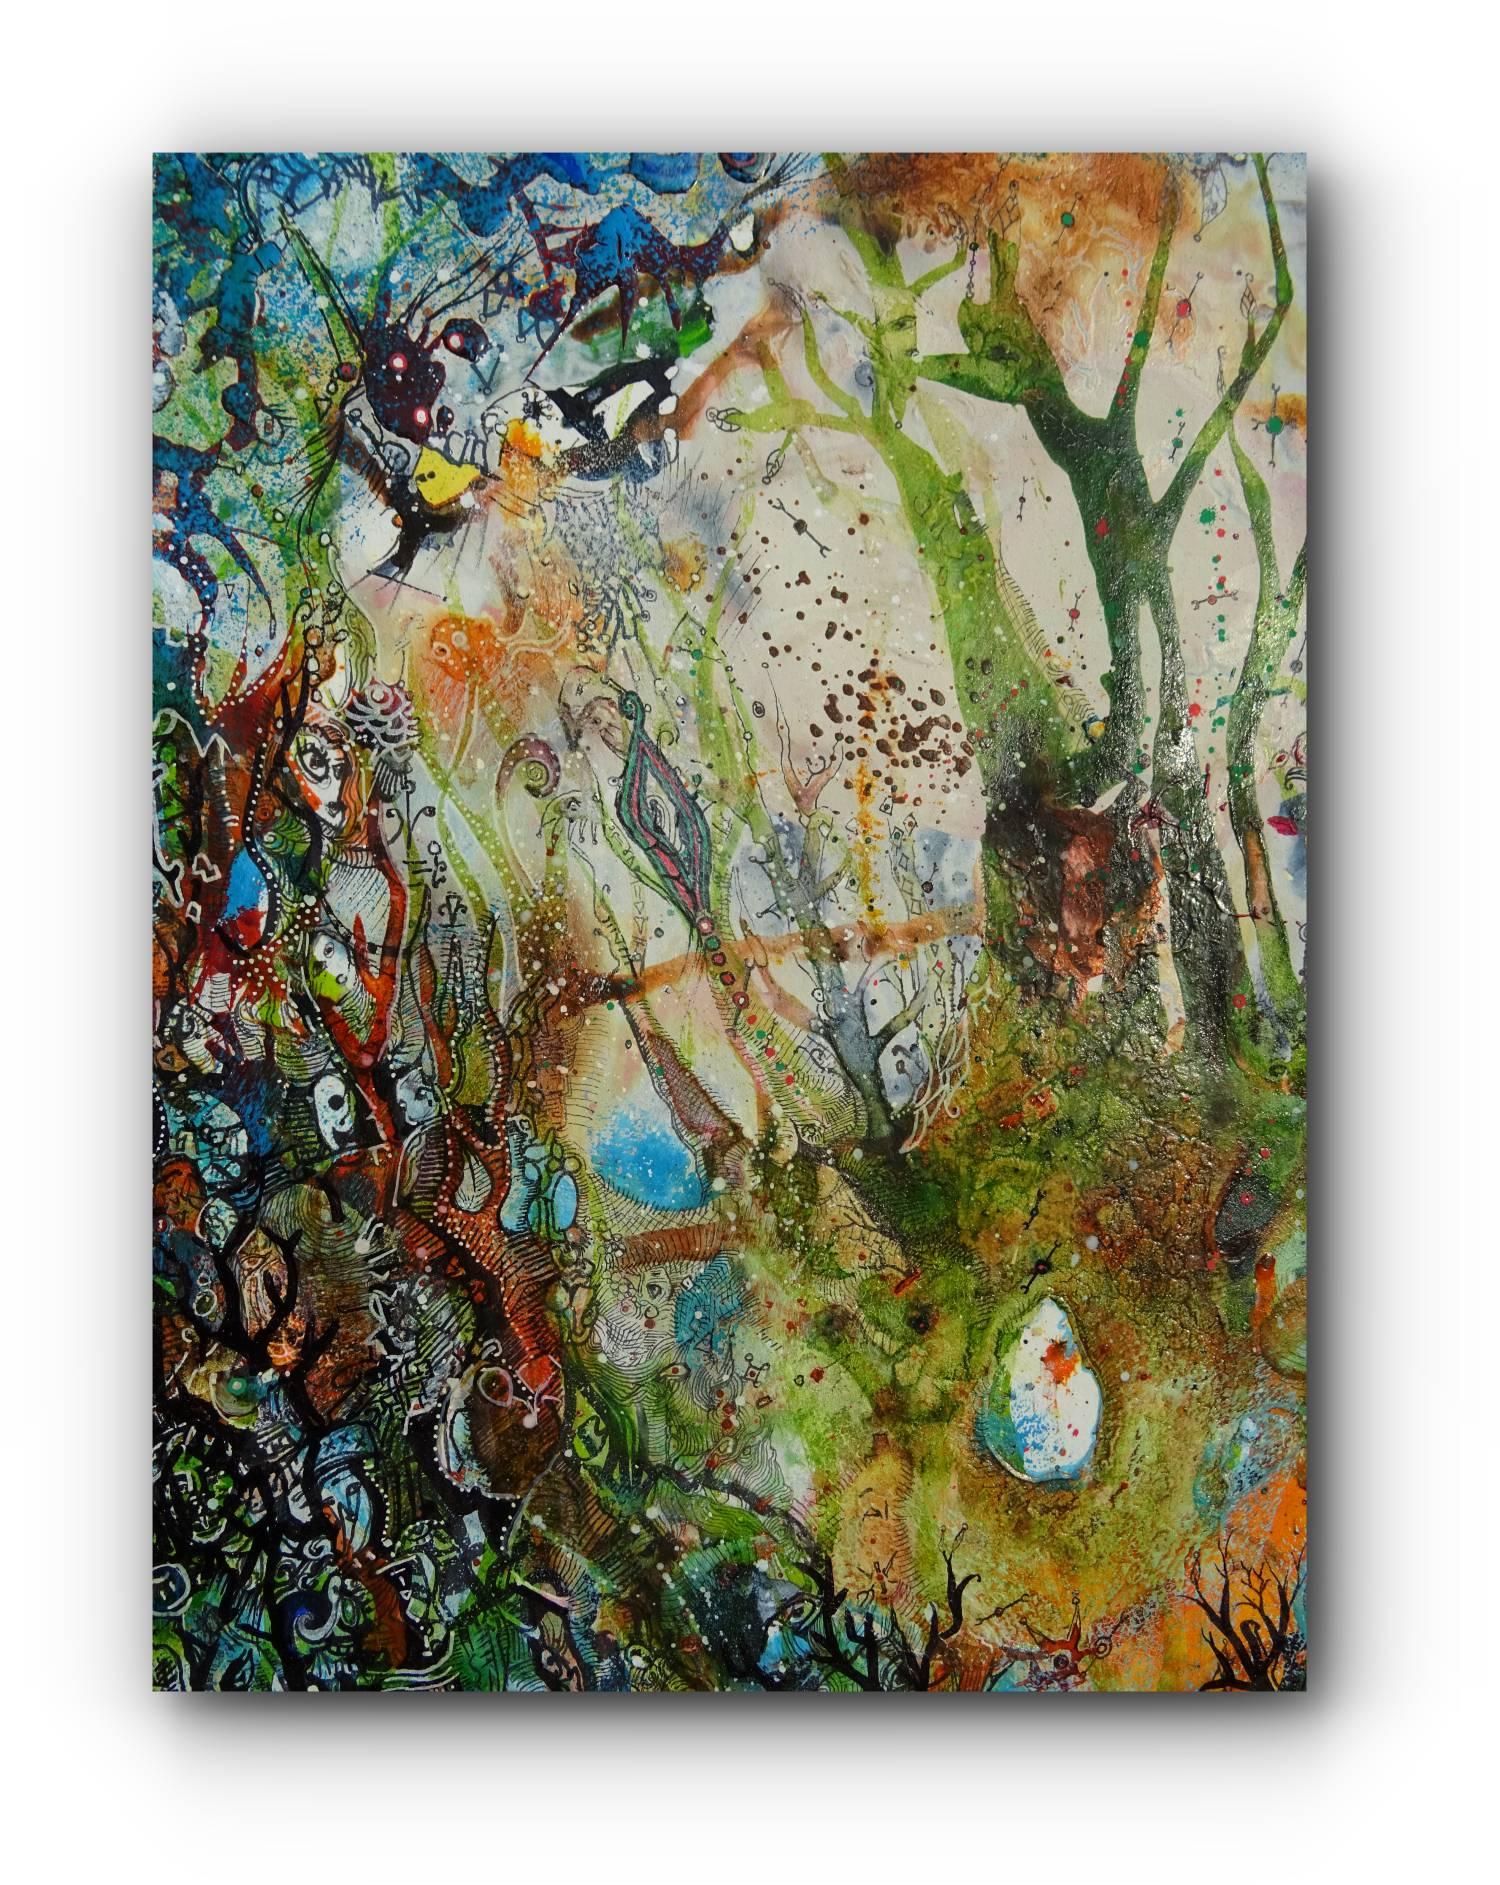 painting-detail-1-heart-forest-artists-ingress-vortices.jpg